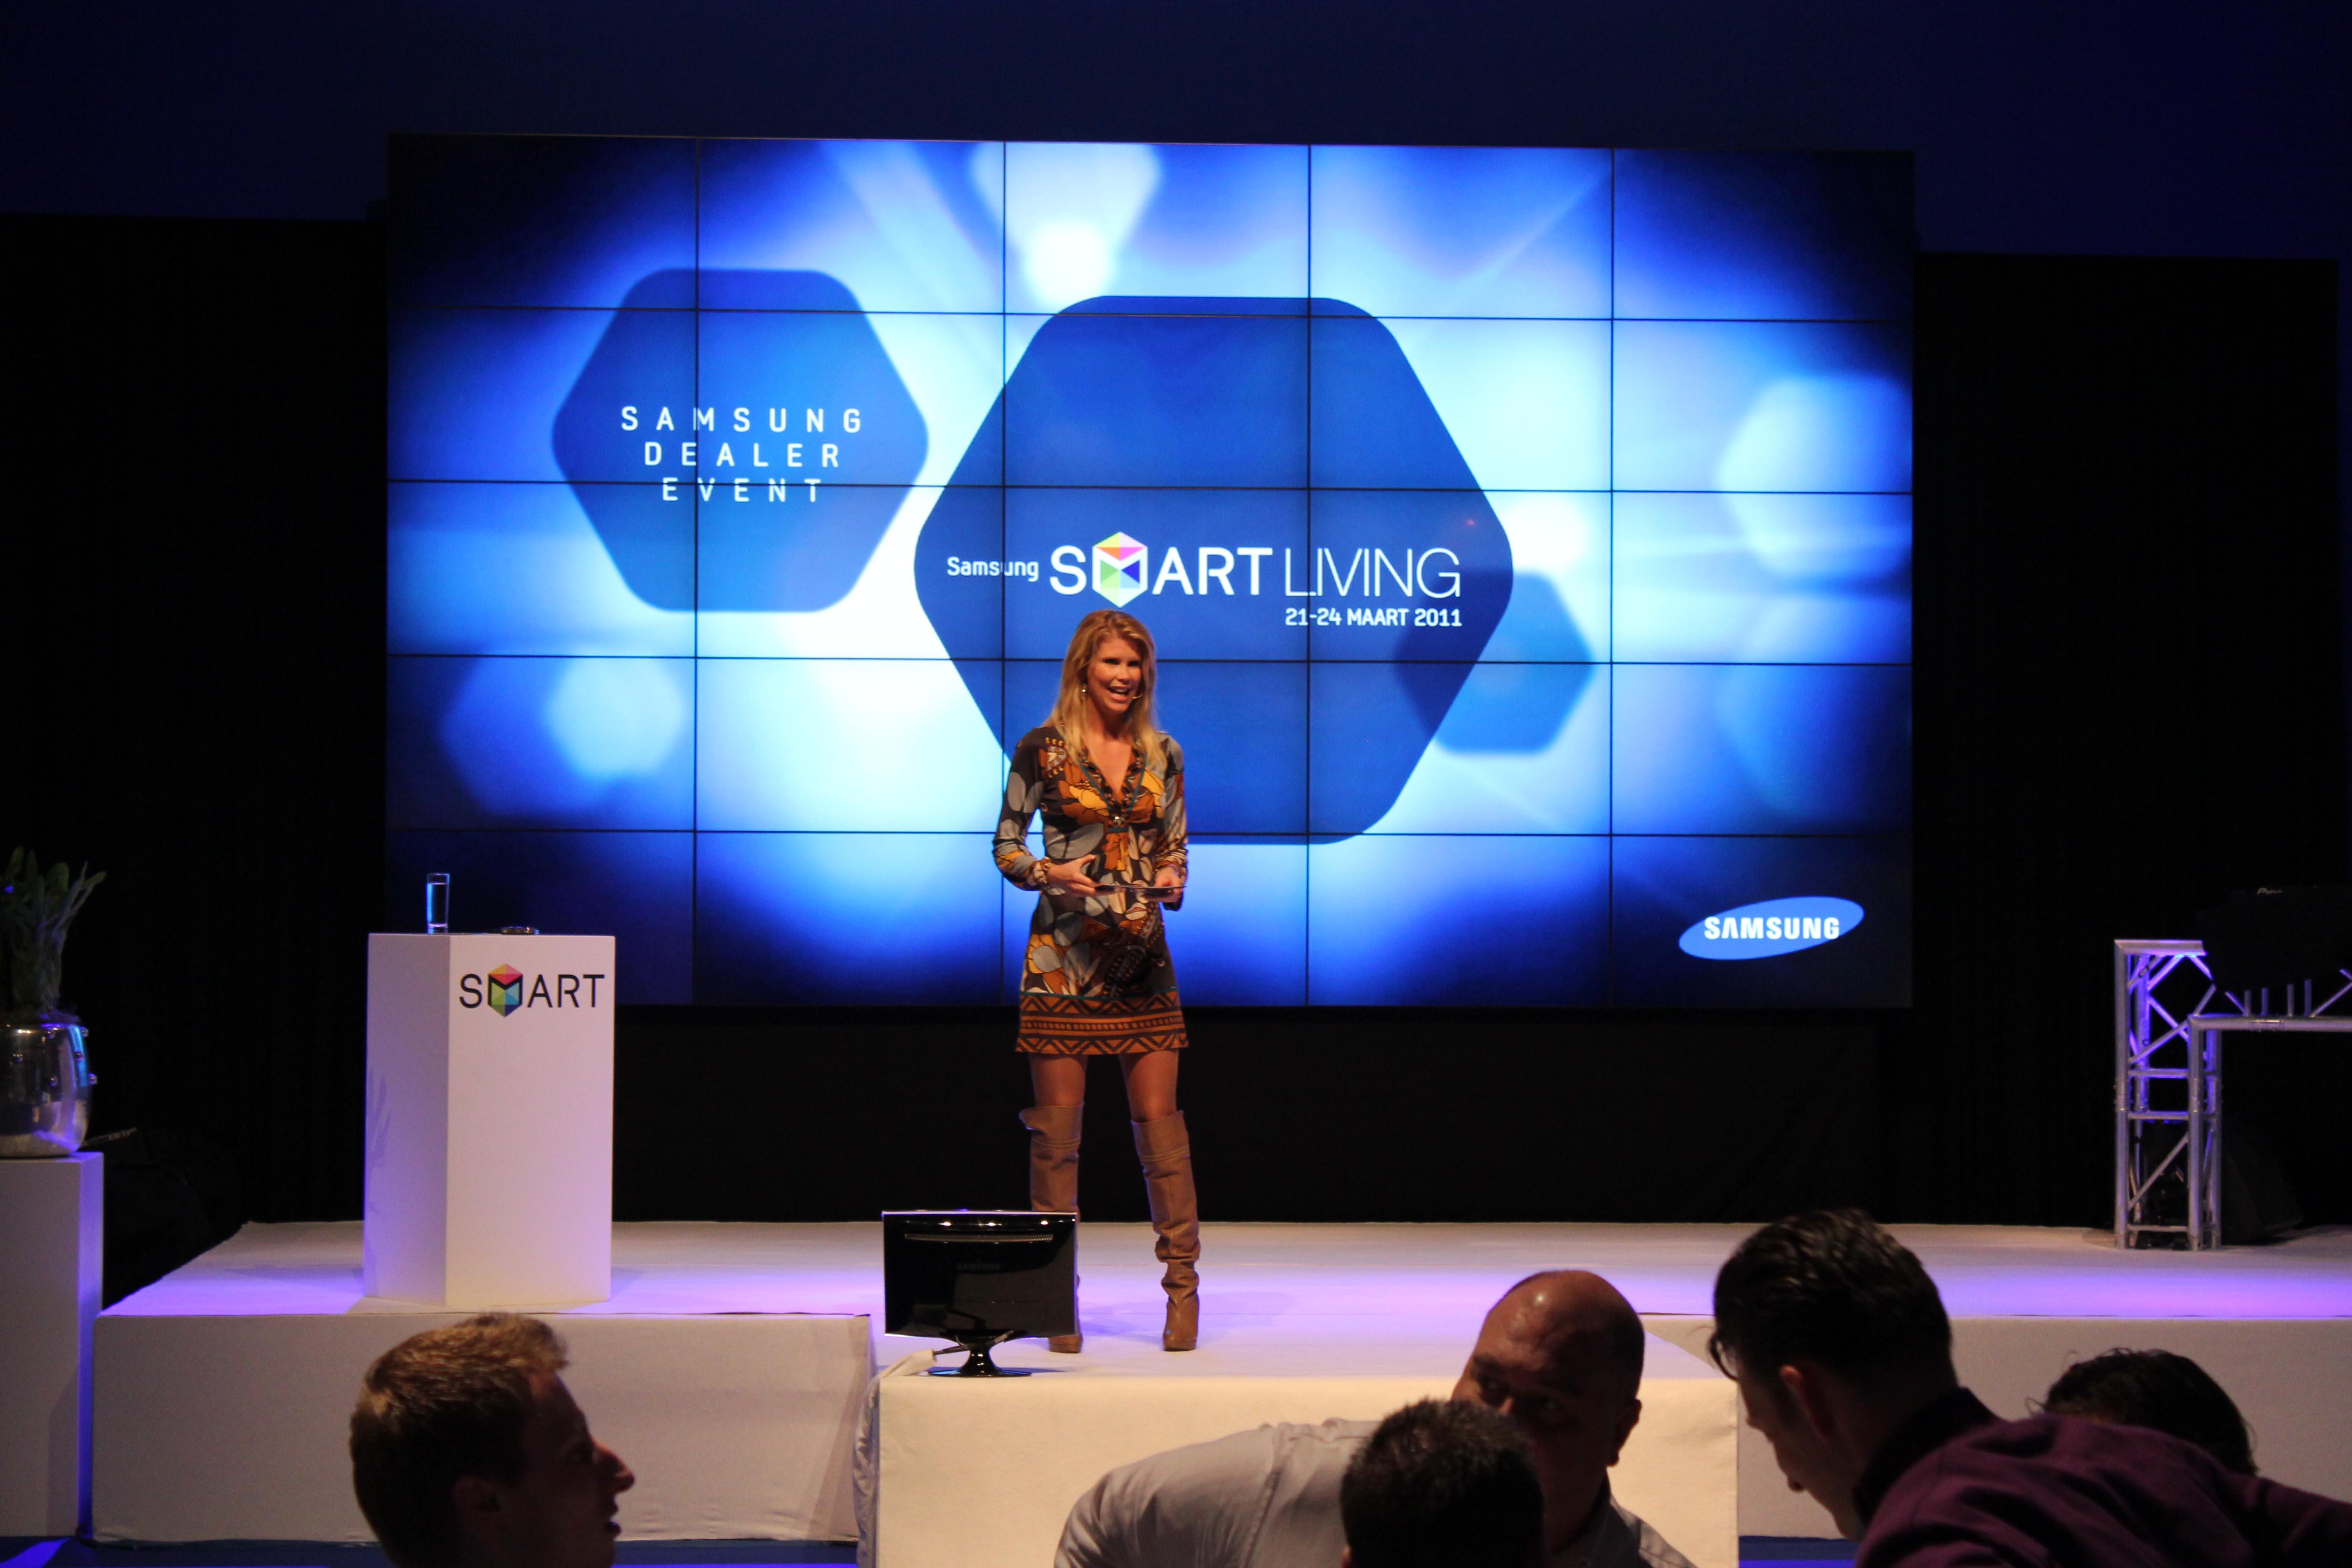 Presentatie Samsung dealerdagen